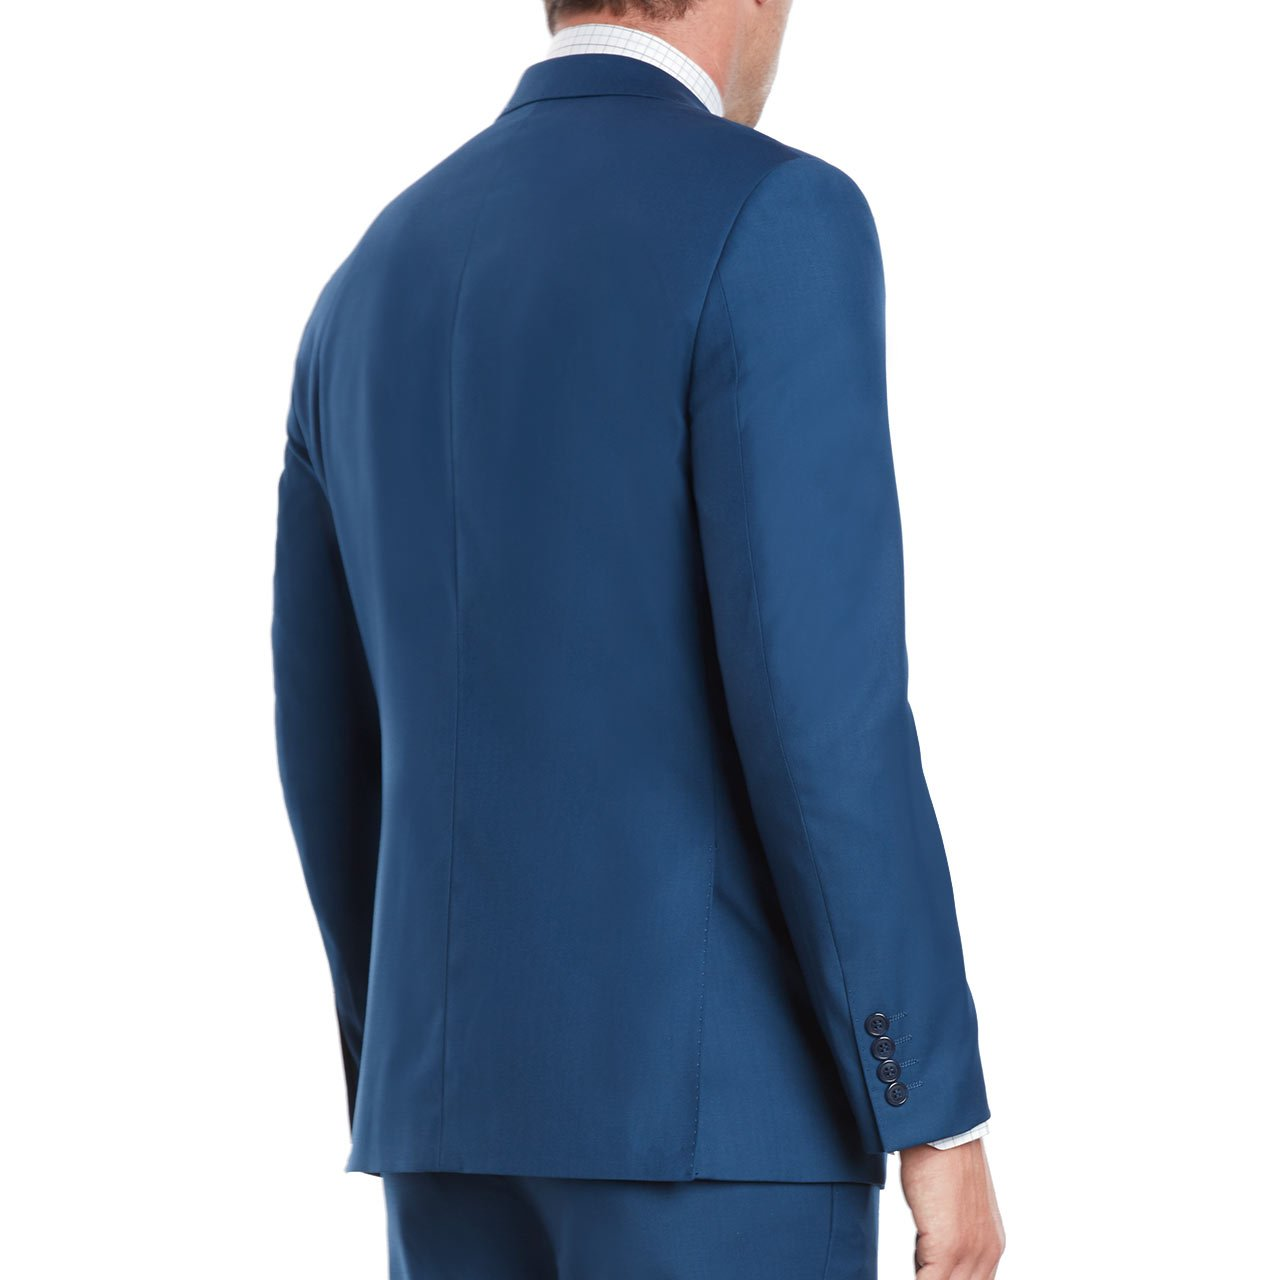 Mens Slim Fit Notched Lapel 3 Piece Suit Set Designed by Taheri French Blue 80/20(US 36R / EU 46R / Waist 30) by Sebastian Taheri Uomo (Image #6)